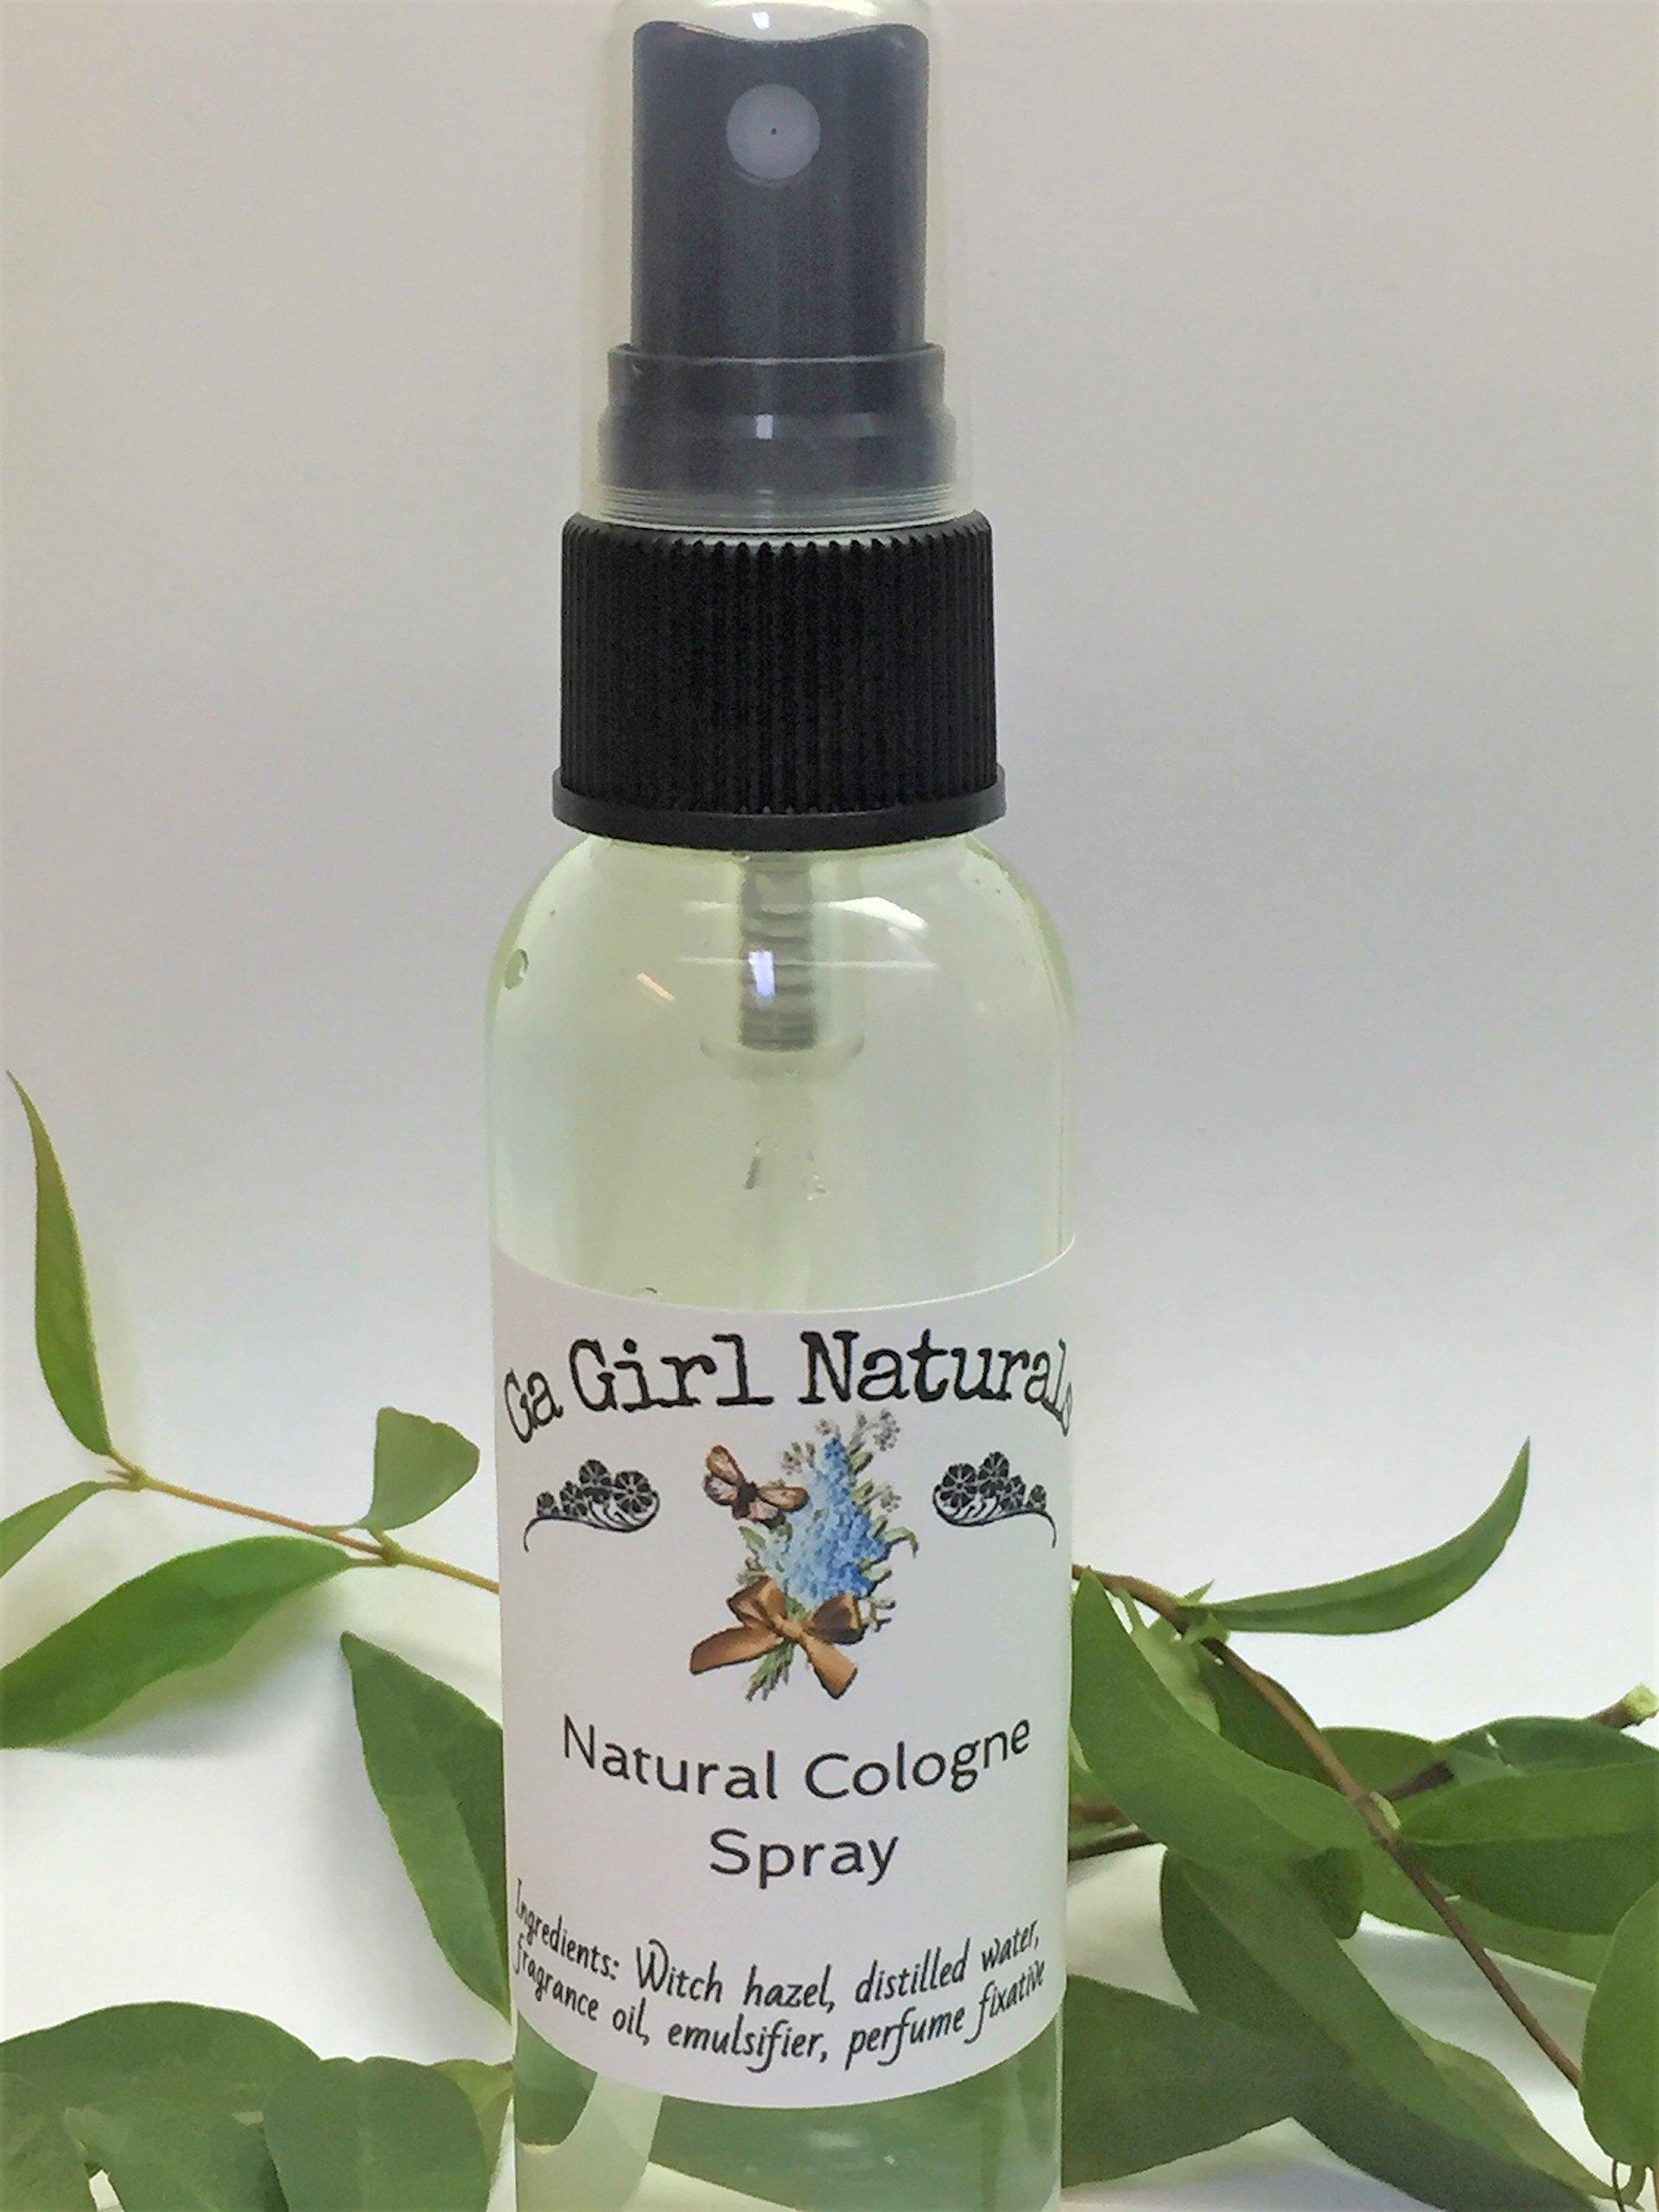 Black Orchid Type Men's Natural Cologne Spray, Cologne, Perfume, Handmade, Unisex Fragrance, 2 Oz.